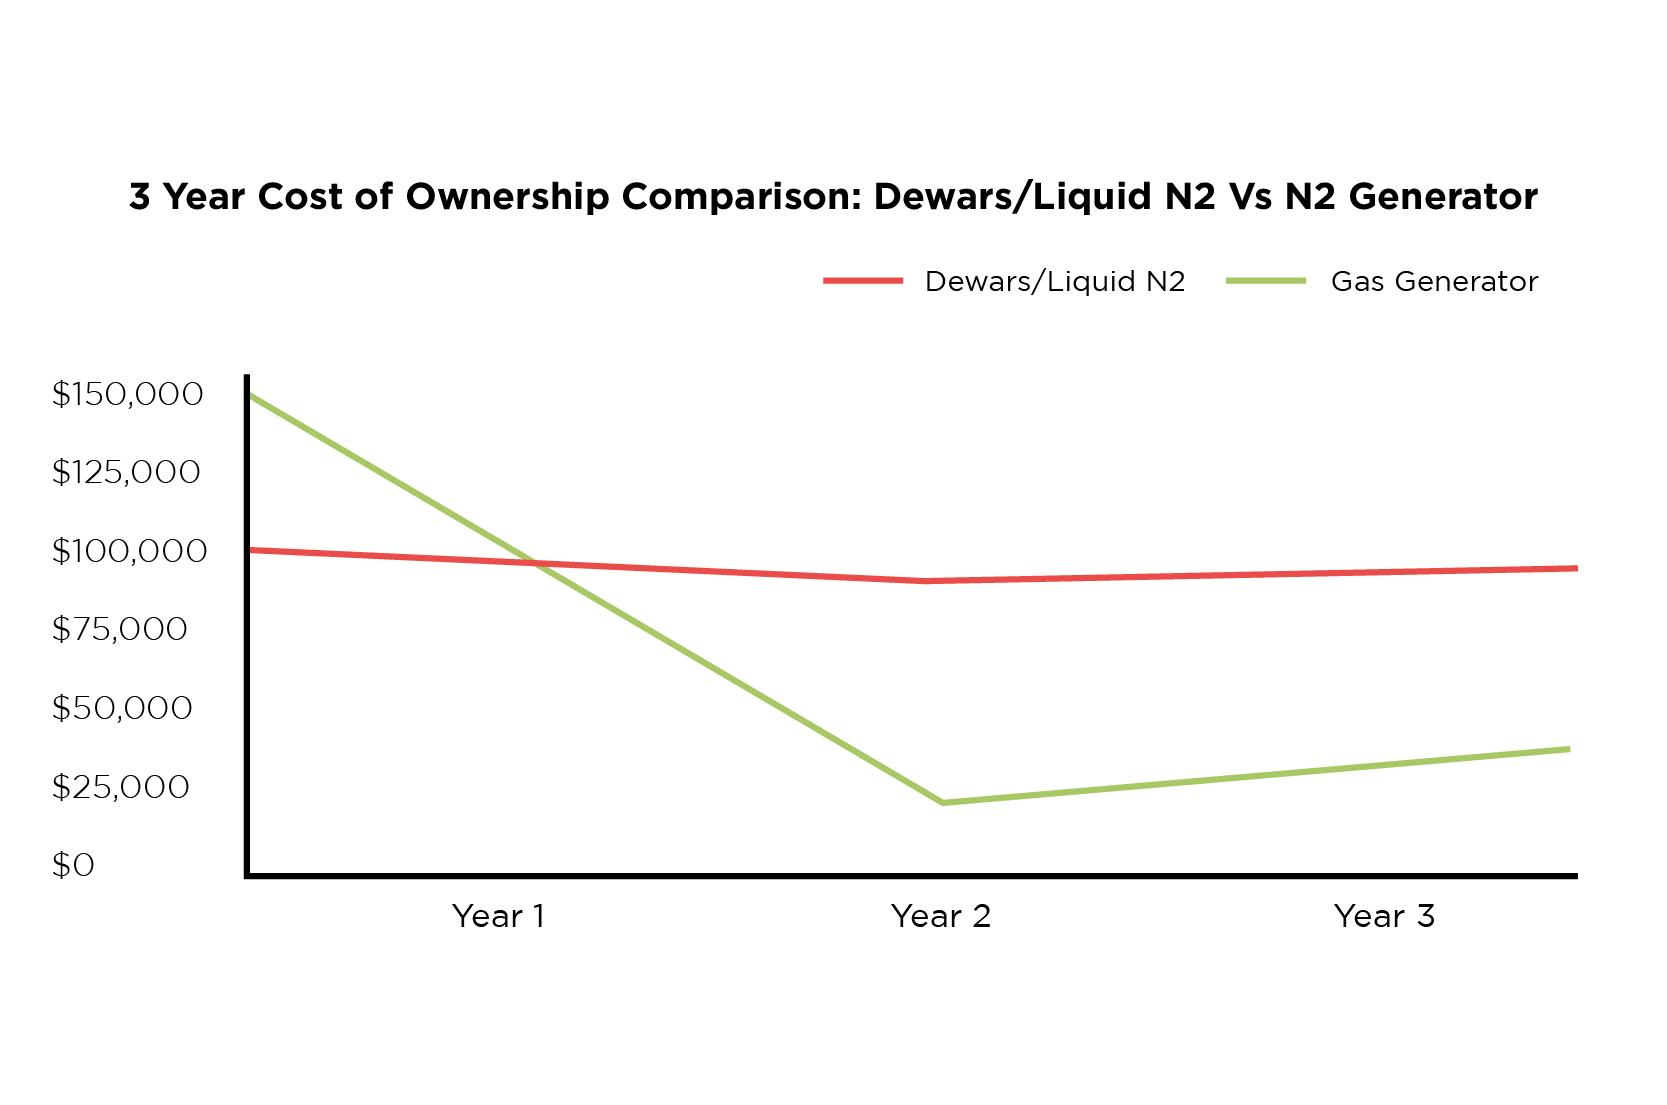 3 year cost of ownership comparison: Dewars/ liquid N2 vs N2 generator